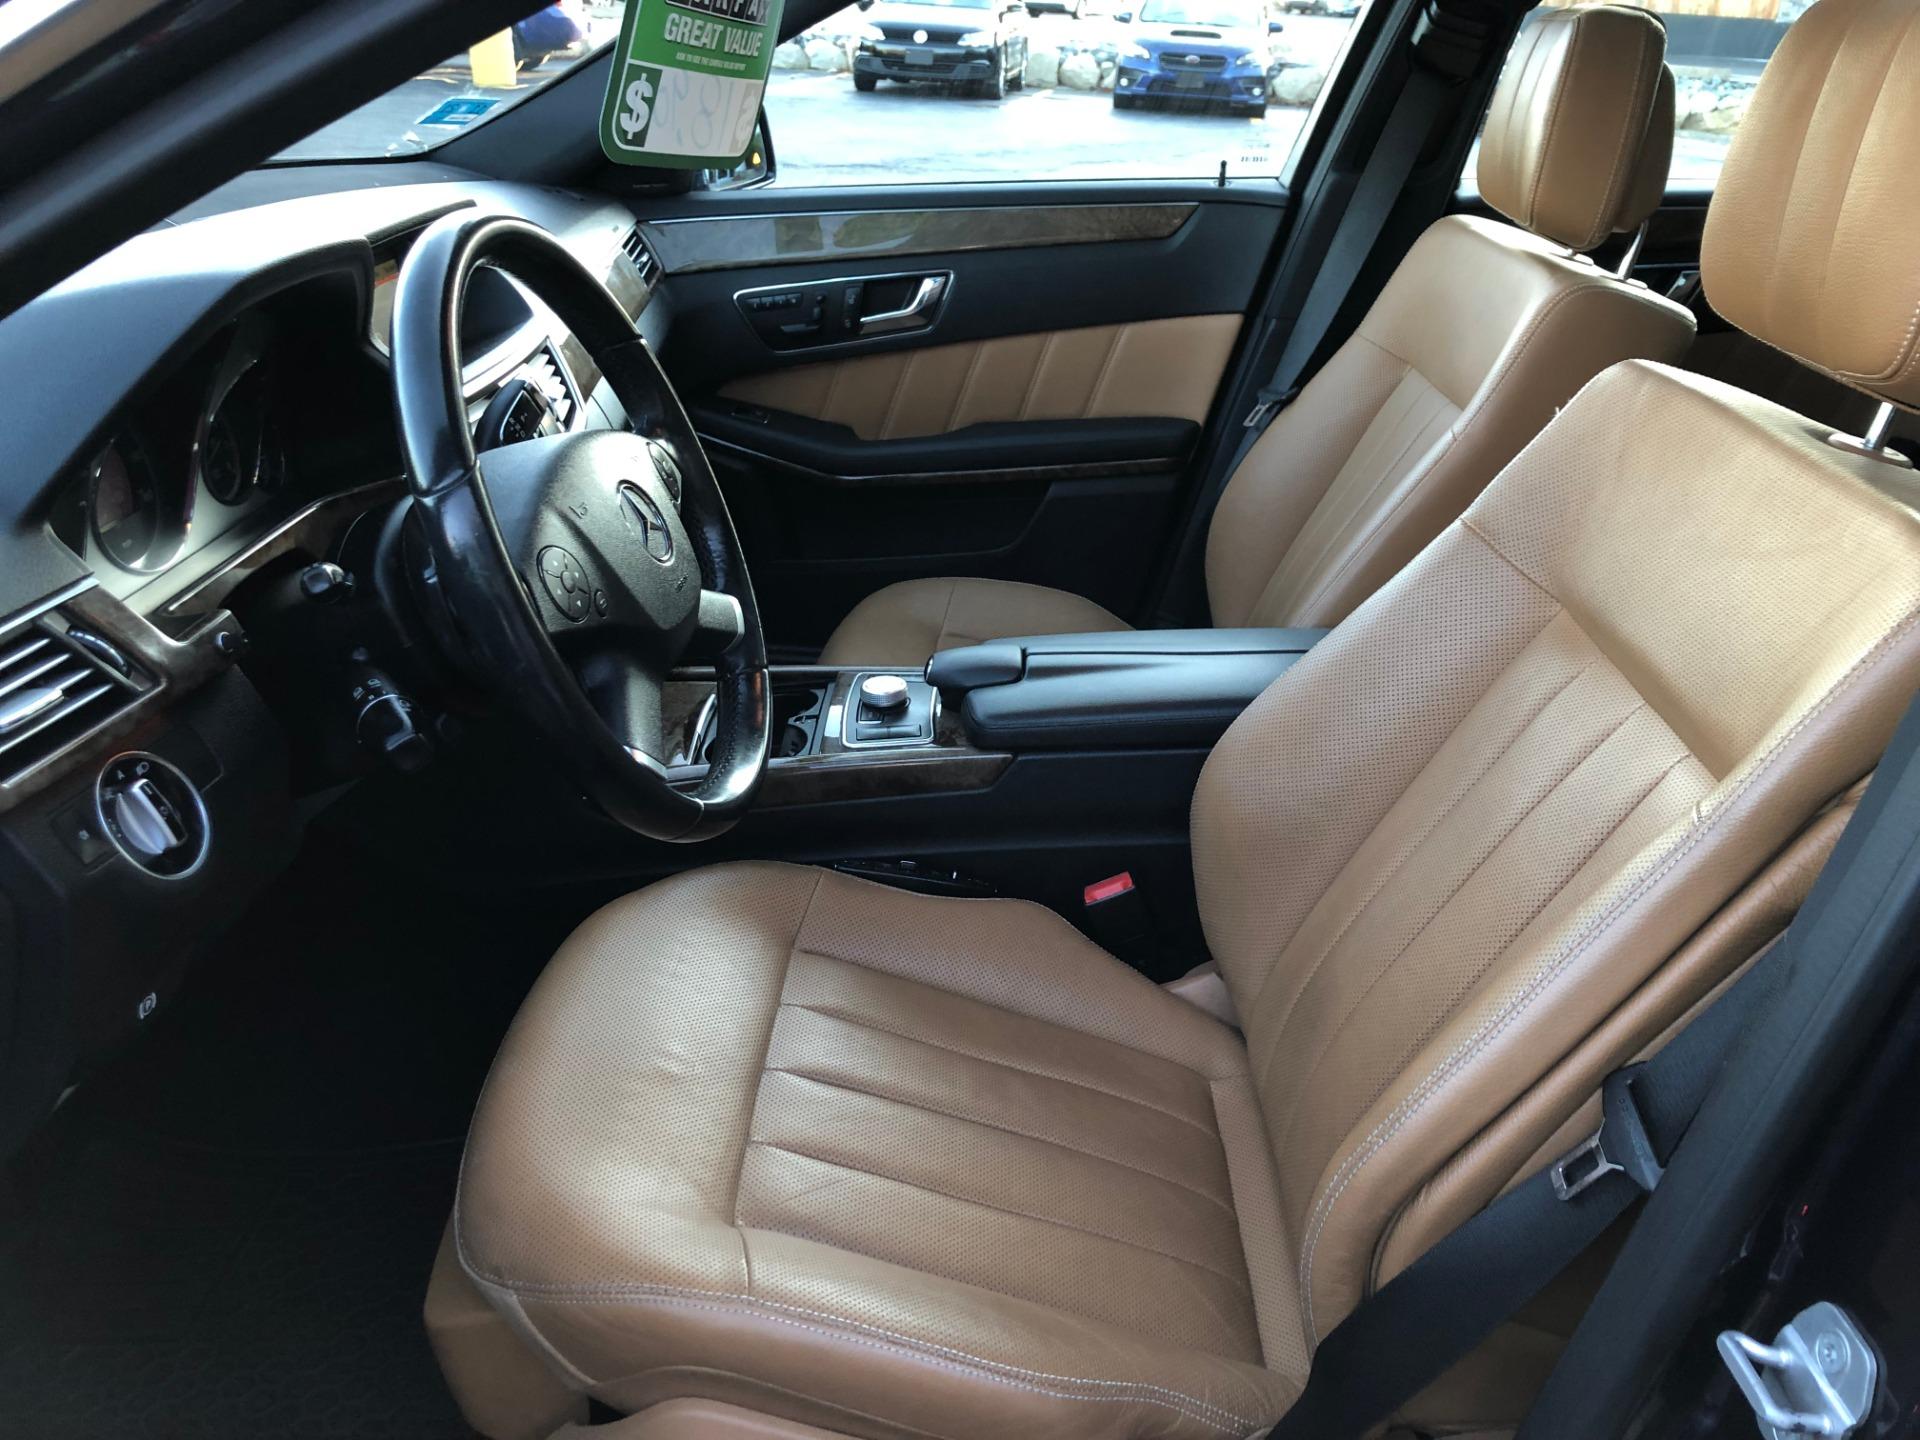 Used-2011-Mercedes-Benz-E-CLASS-E550-4MATIC